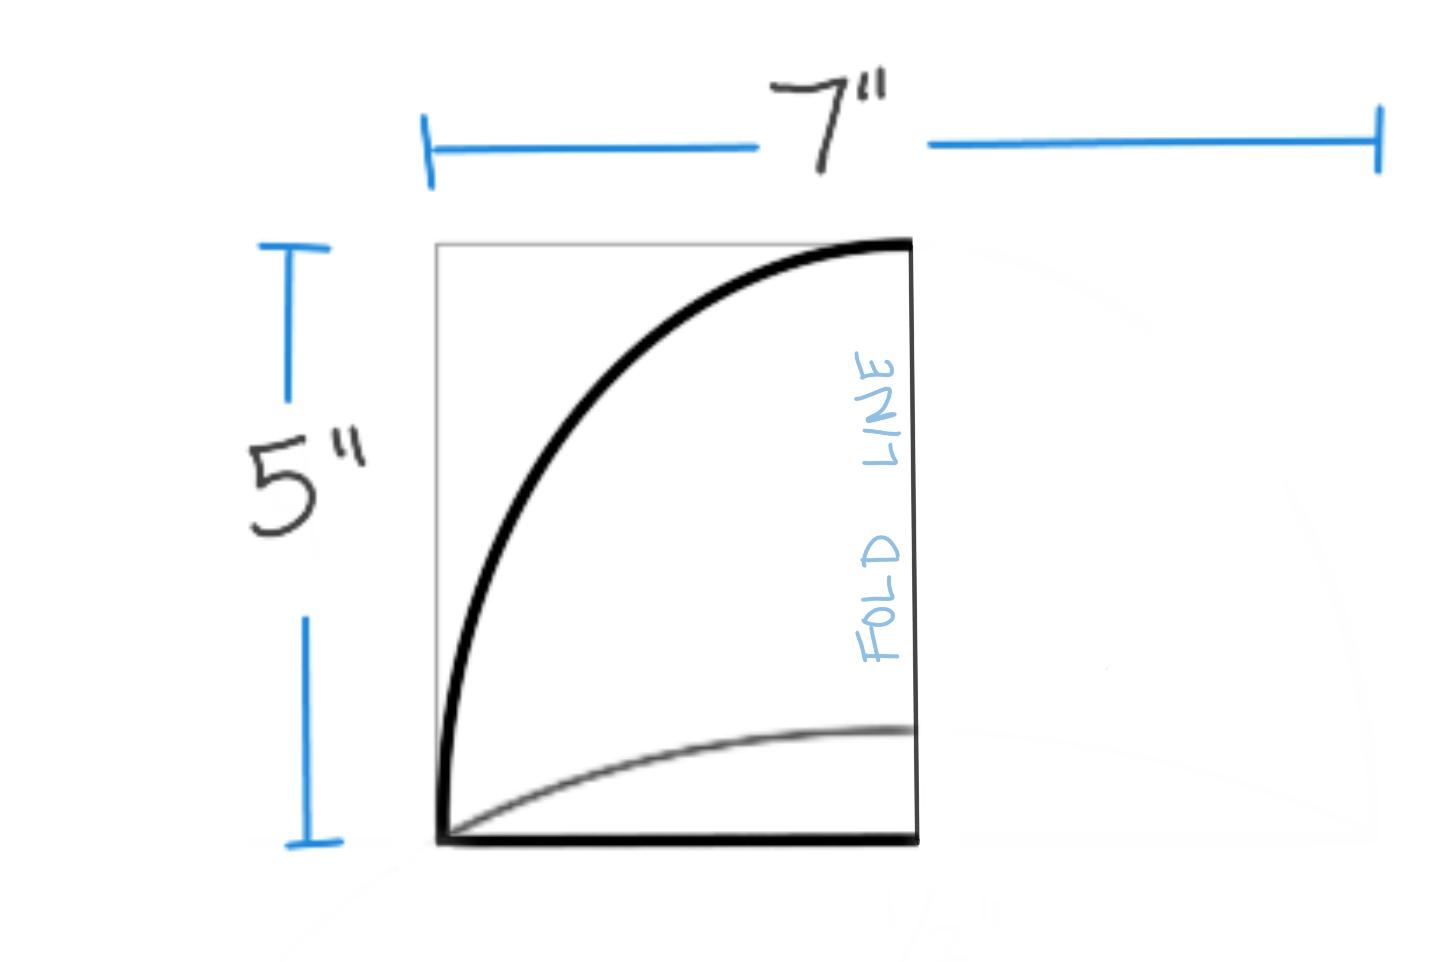 Shoulder pad curve